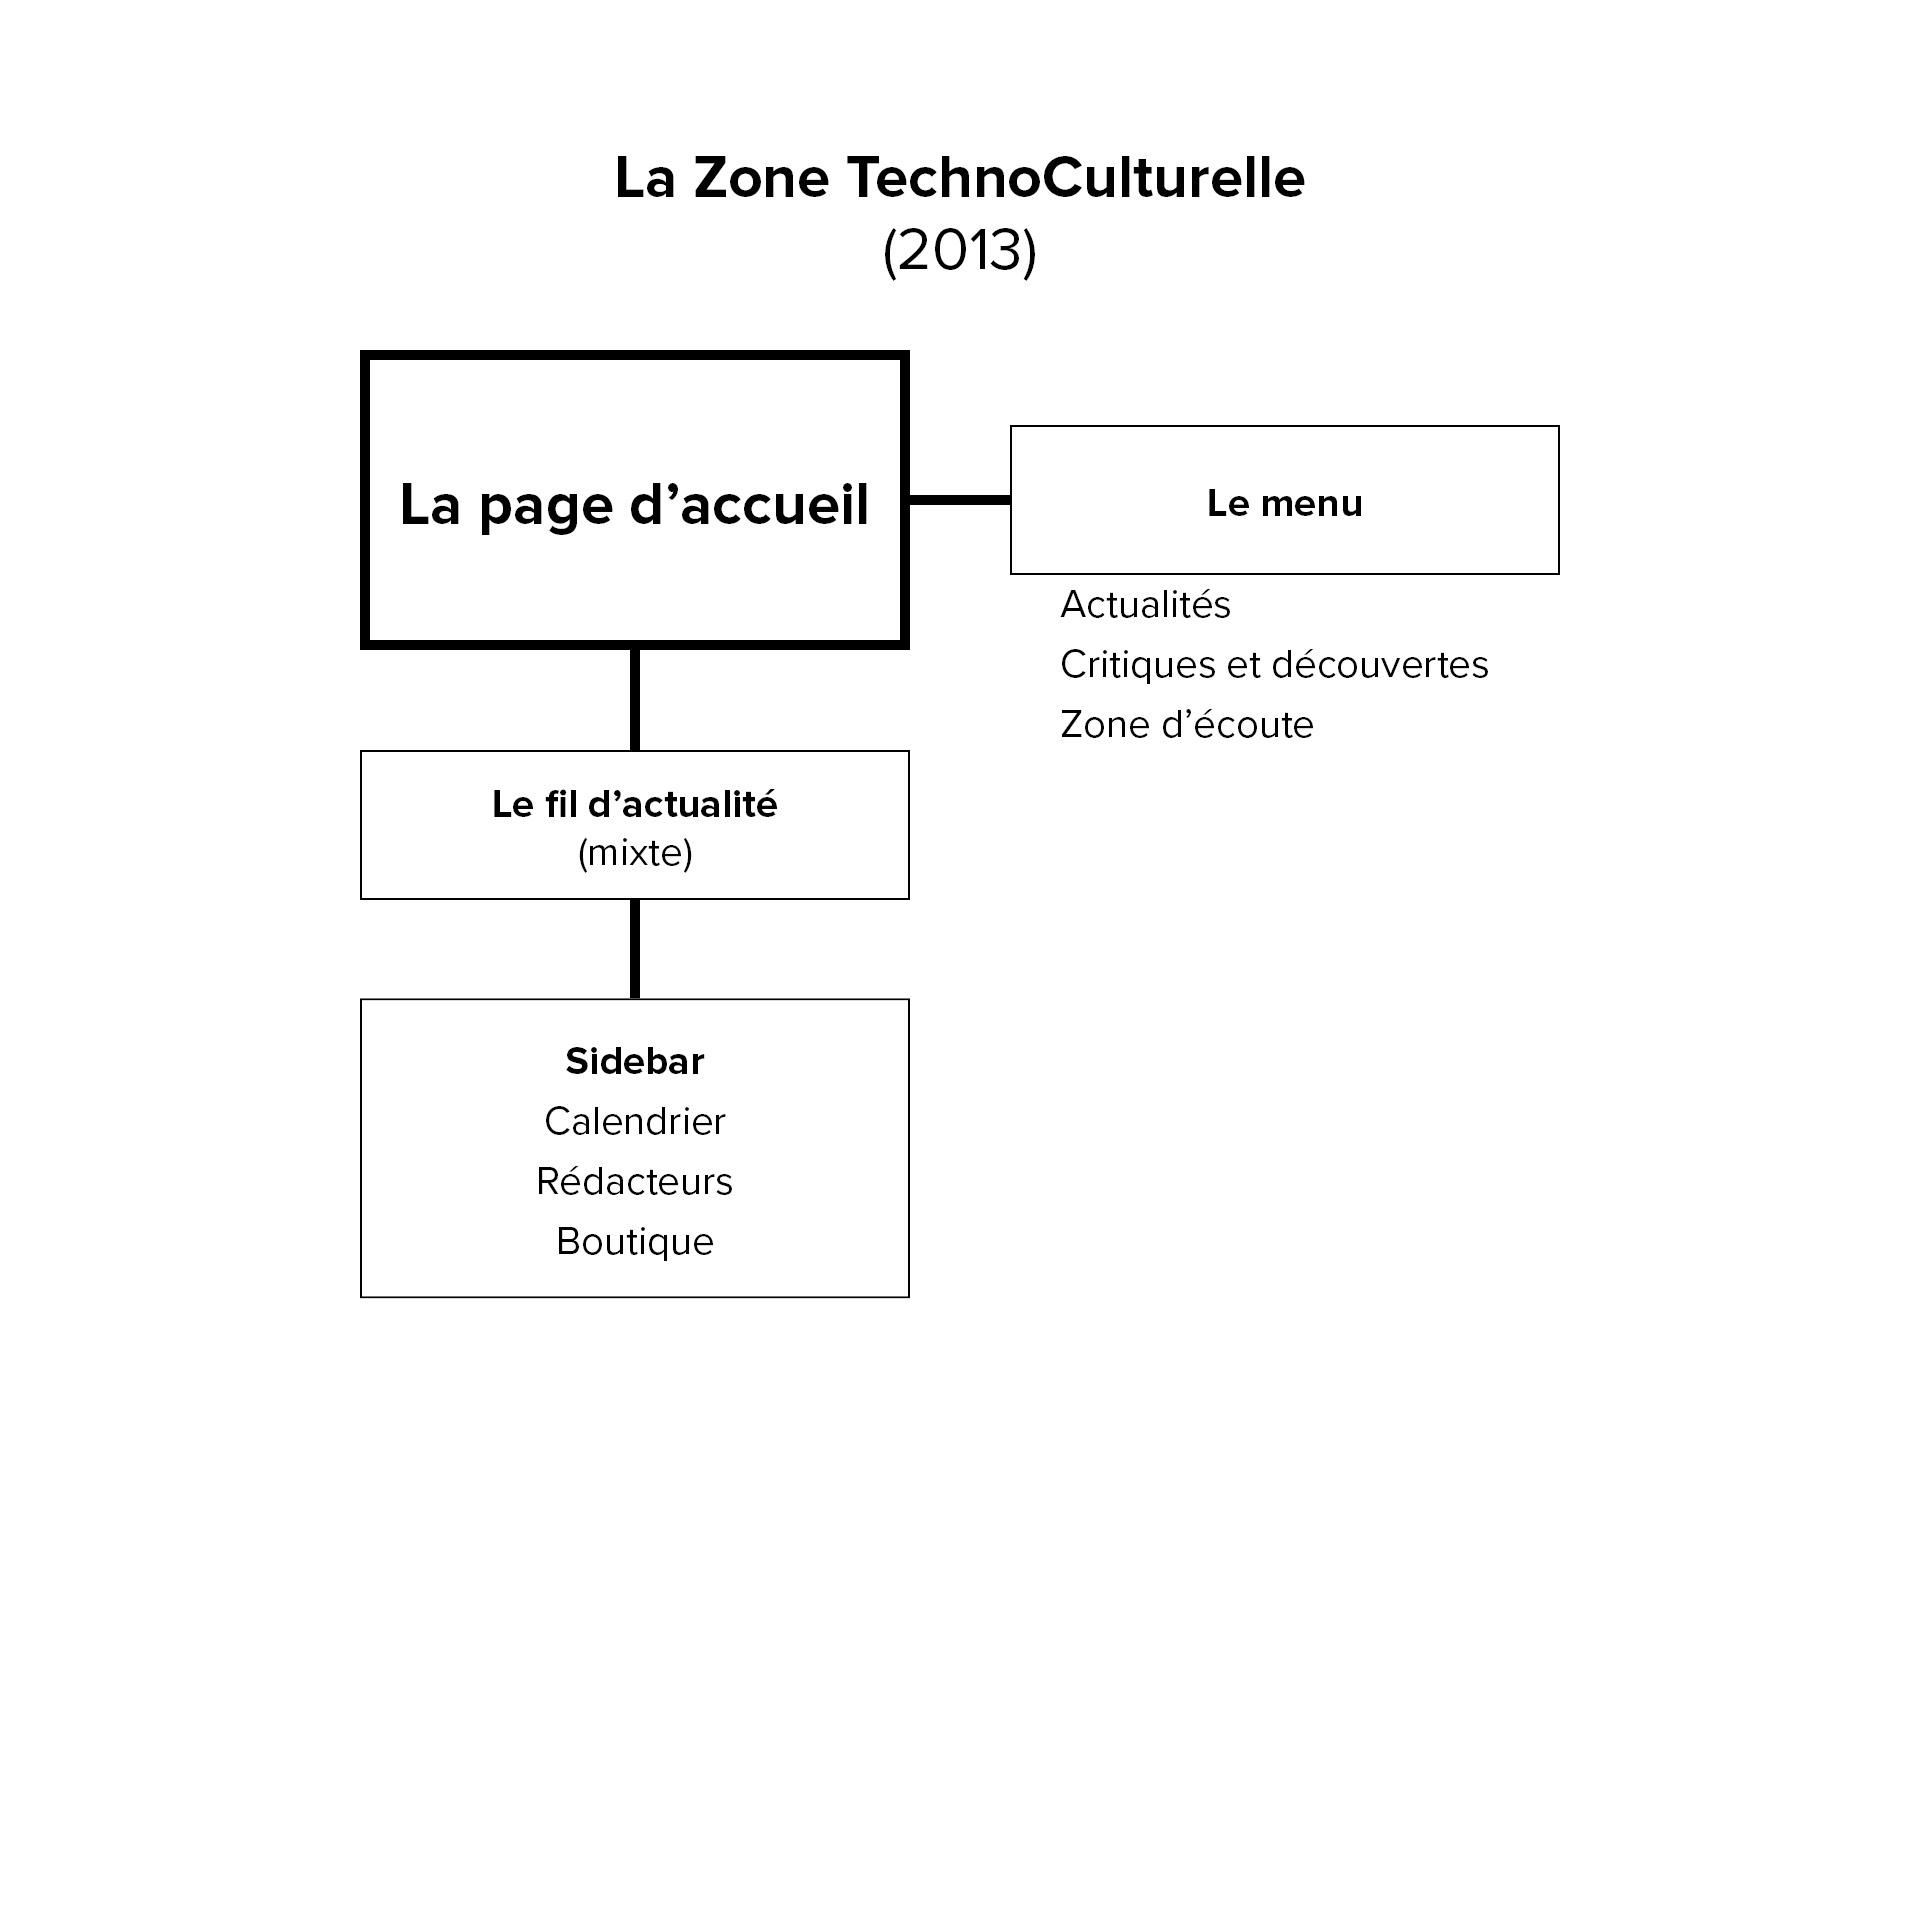 ZTC 2013